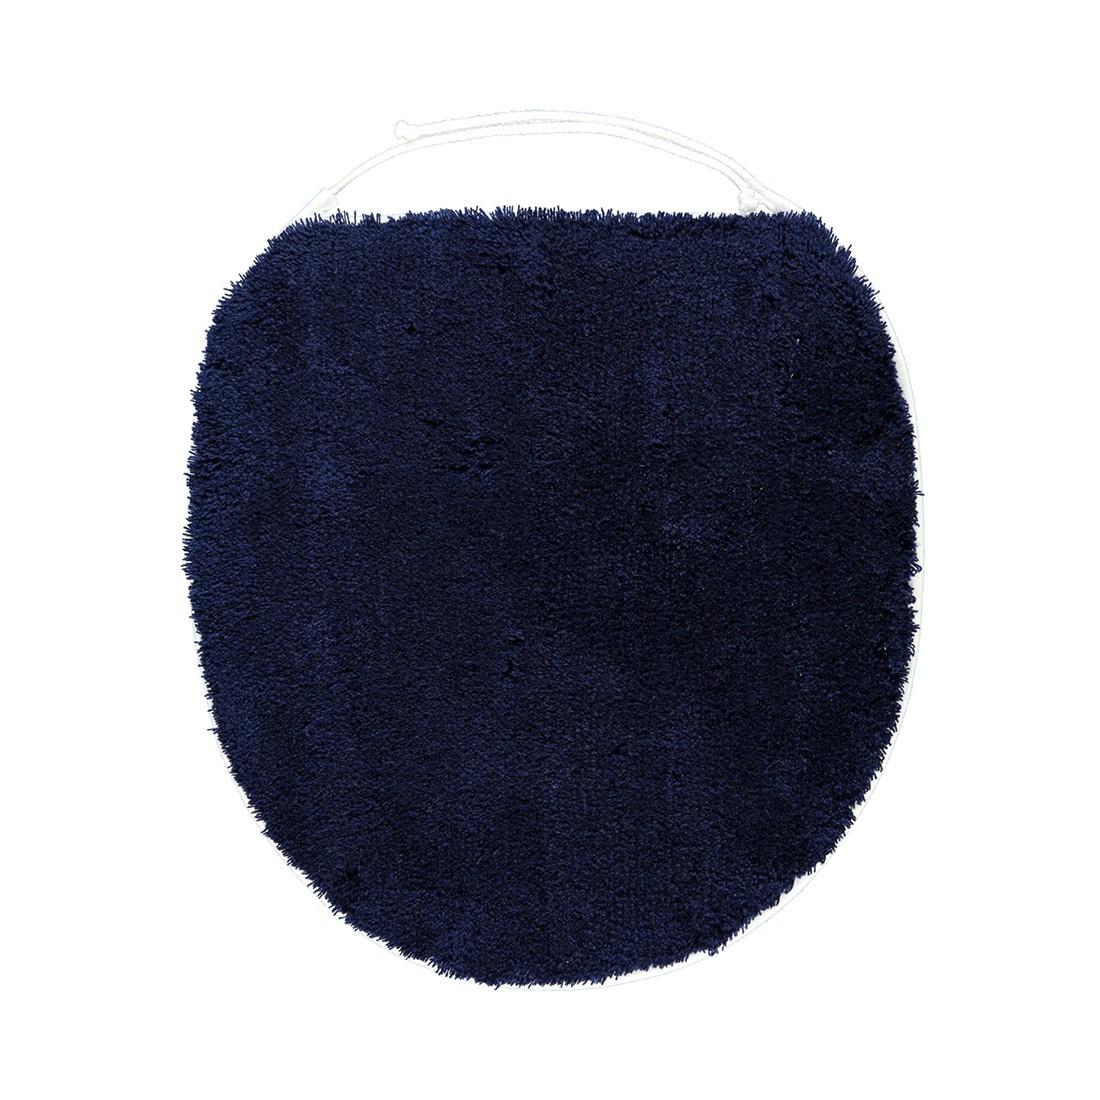 Deckelbezug Soft – 100% Polyacryl Navy – 750, Kleine Wolke kaufen